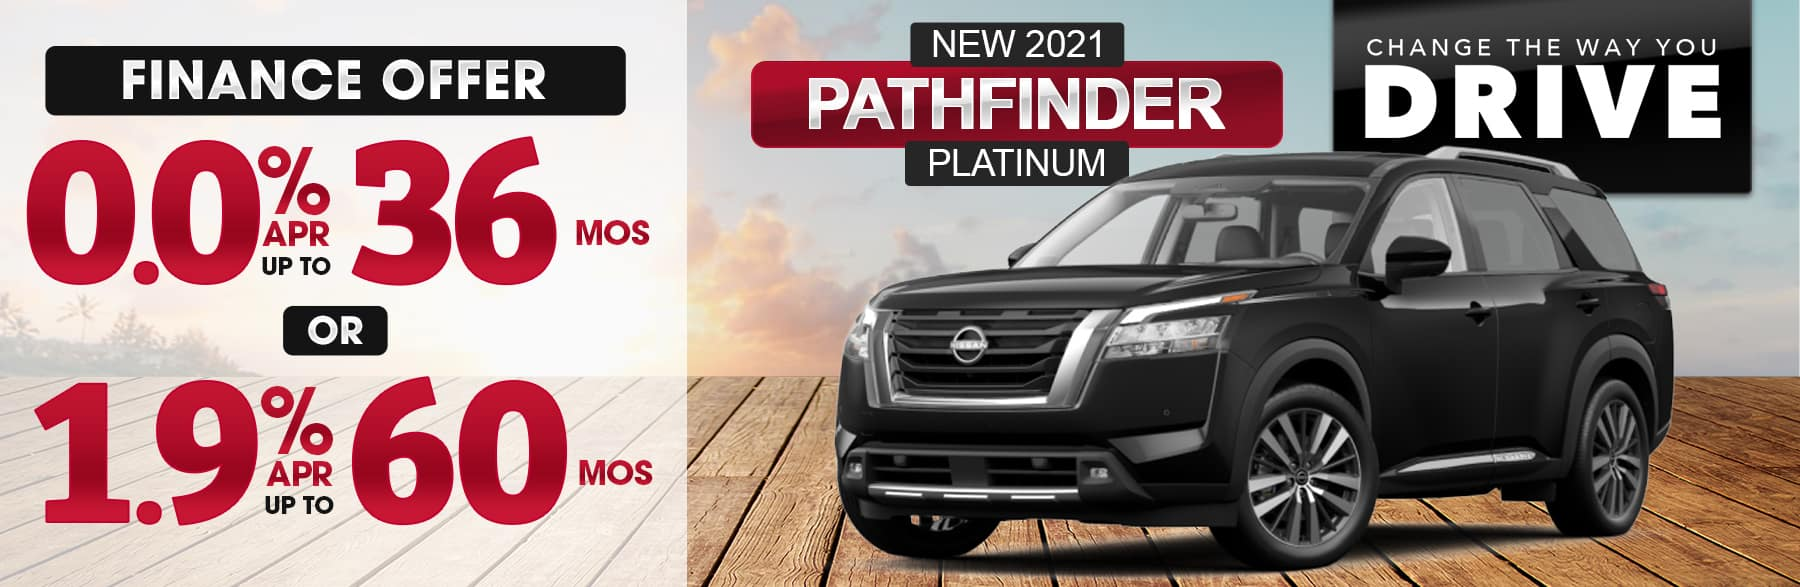 EPN-October21-HP-vUpdated-Pathfinder-2